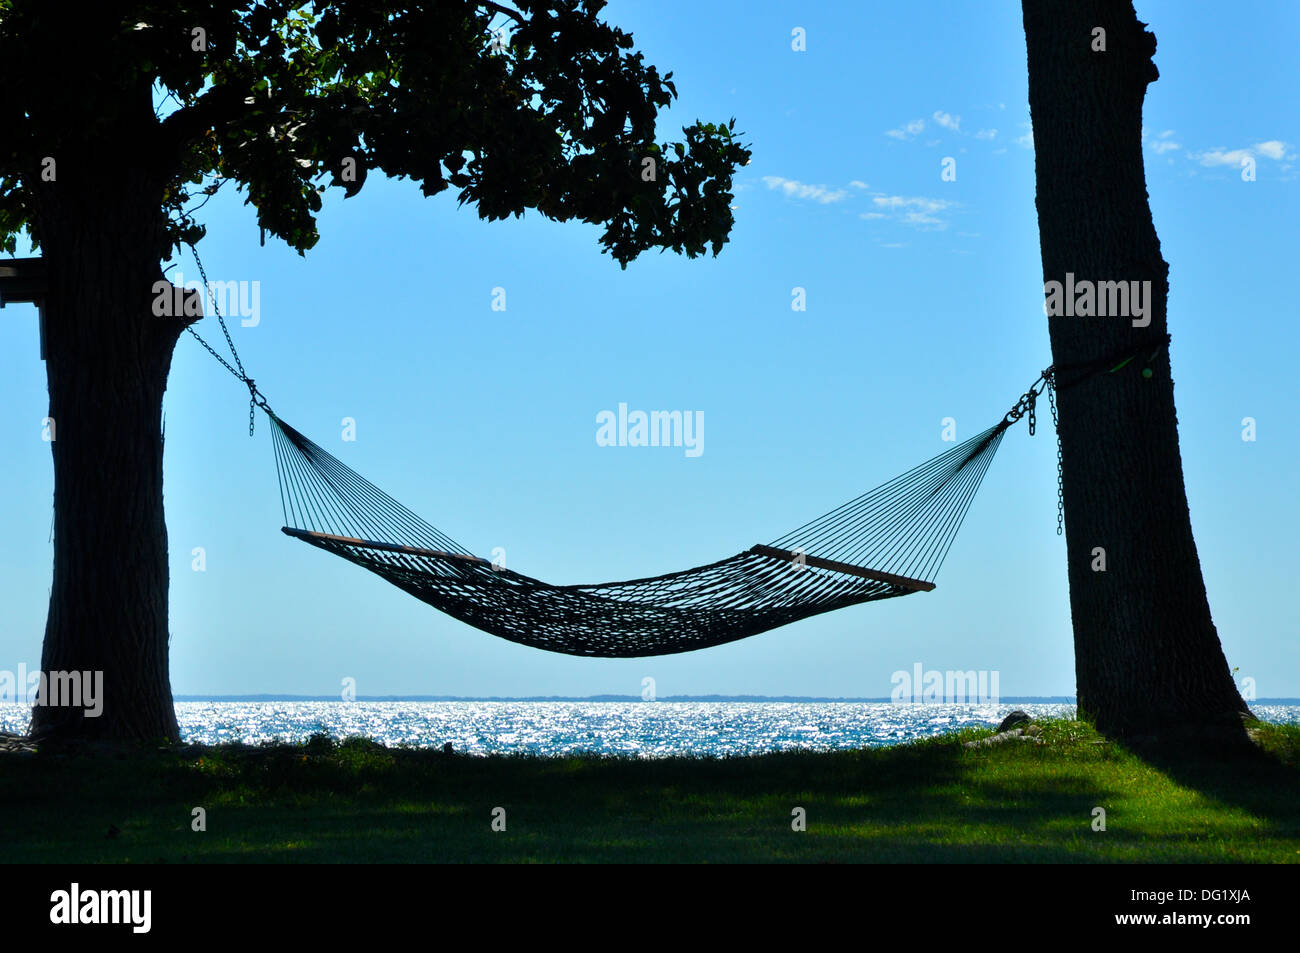 hammock suspended between trees